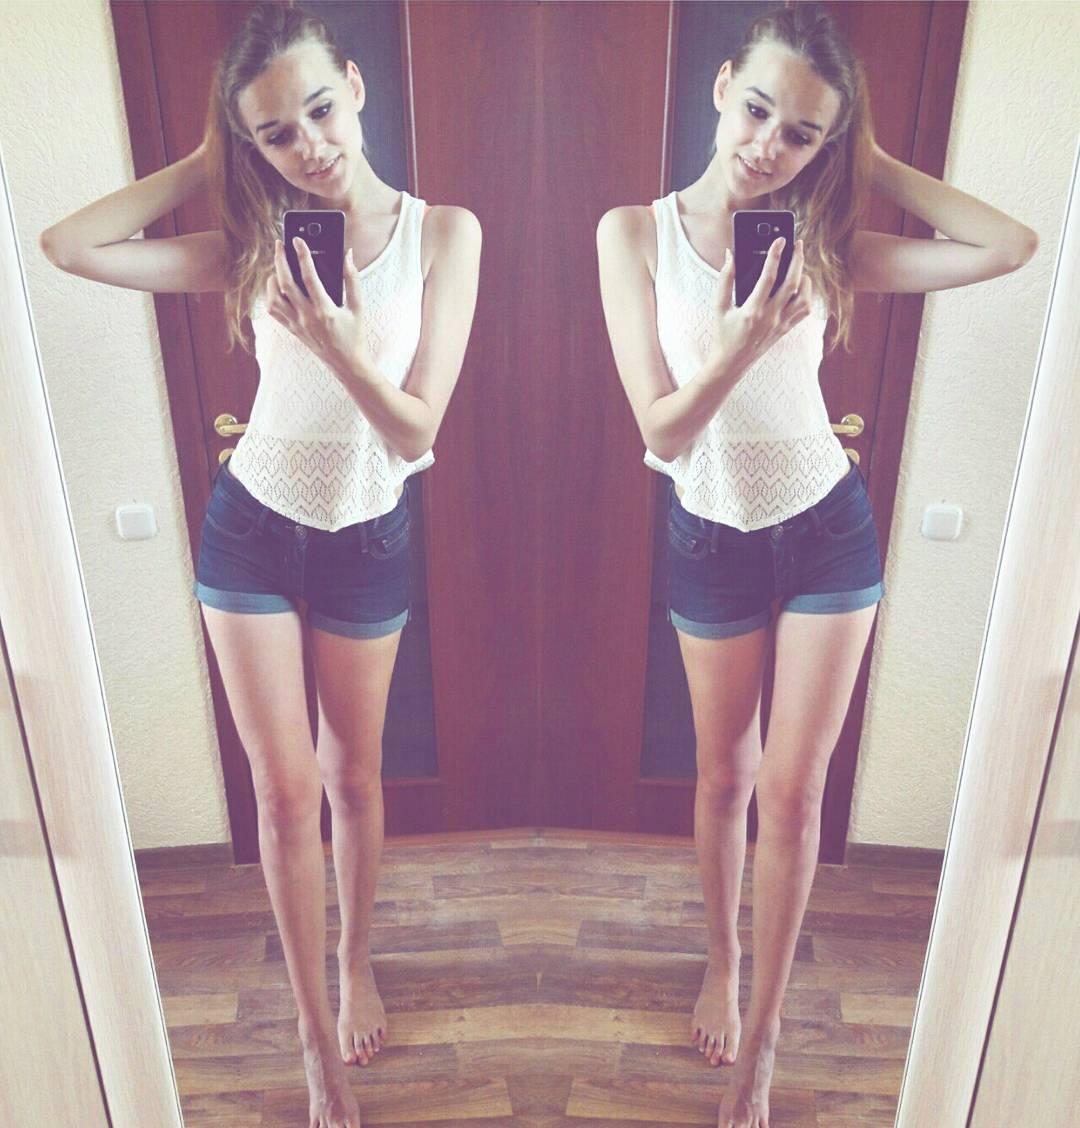 Алина Самойлова: биография блогерши